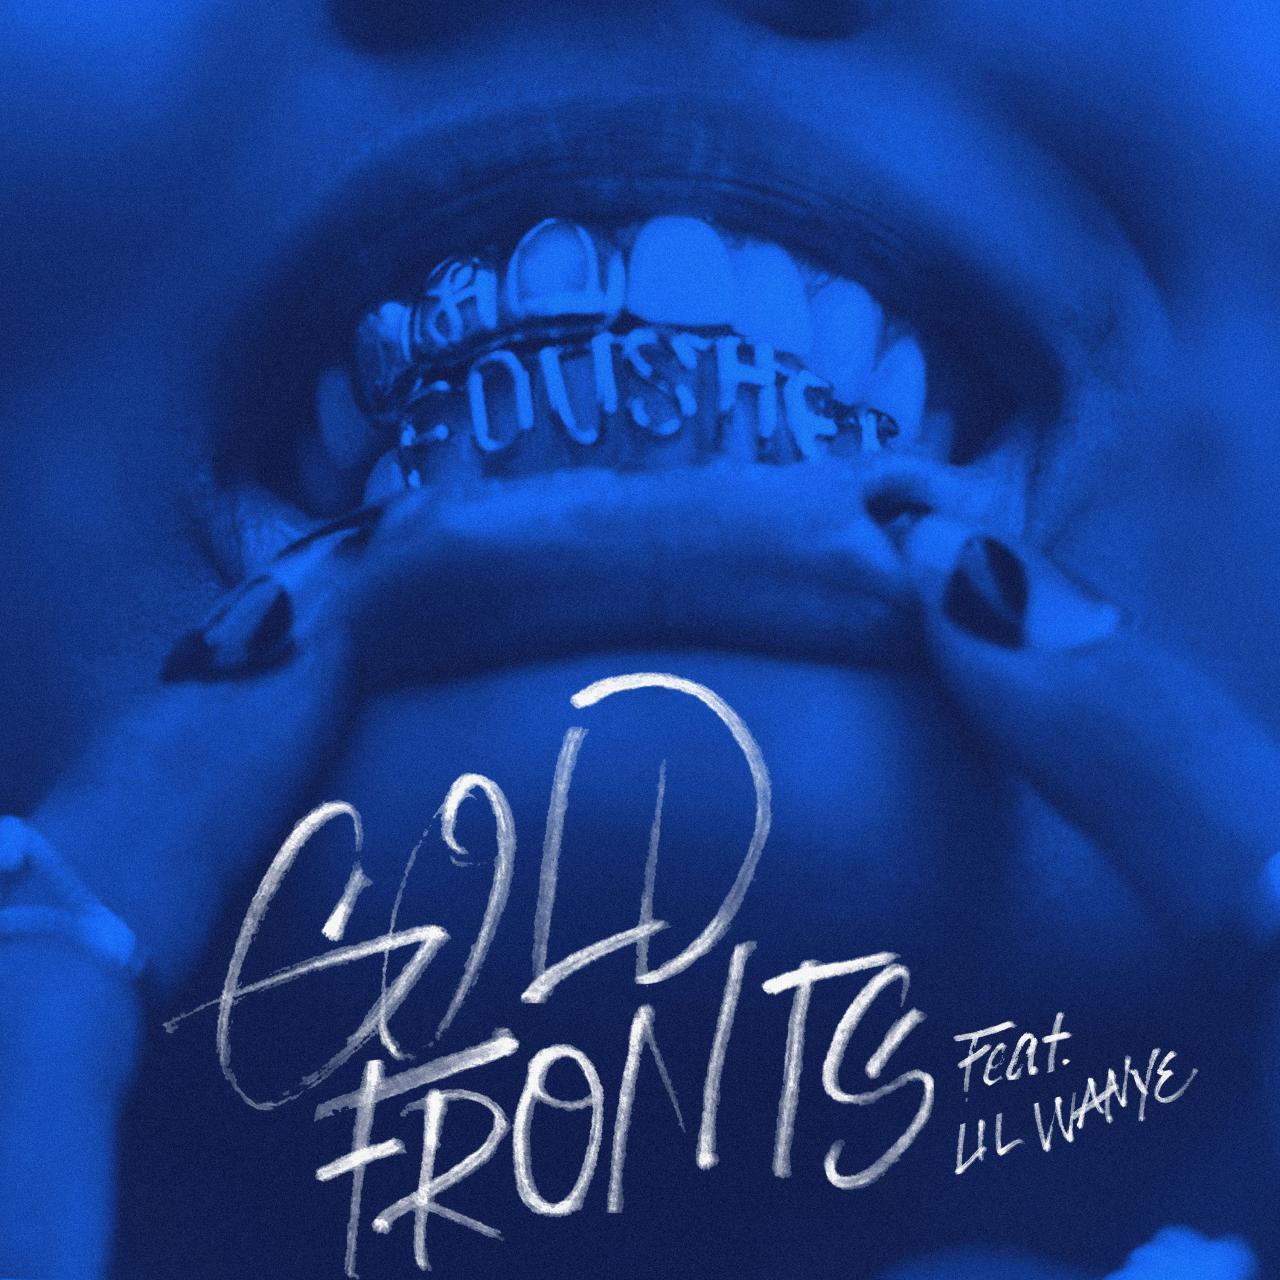 Foushee Ft. Lil Wayne – Gold Fronts